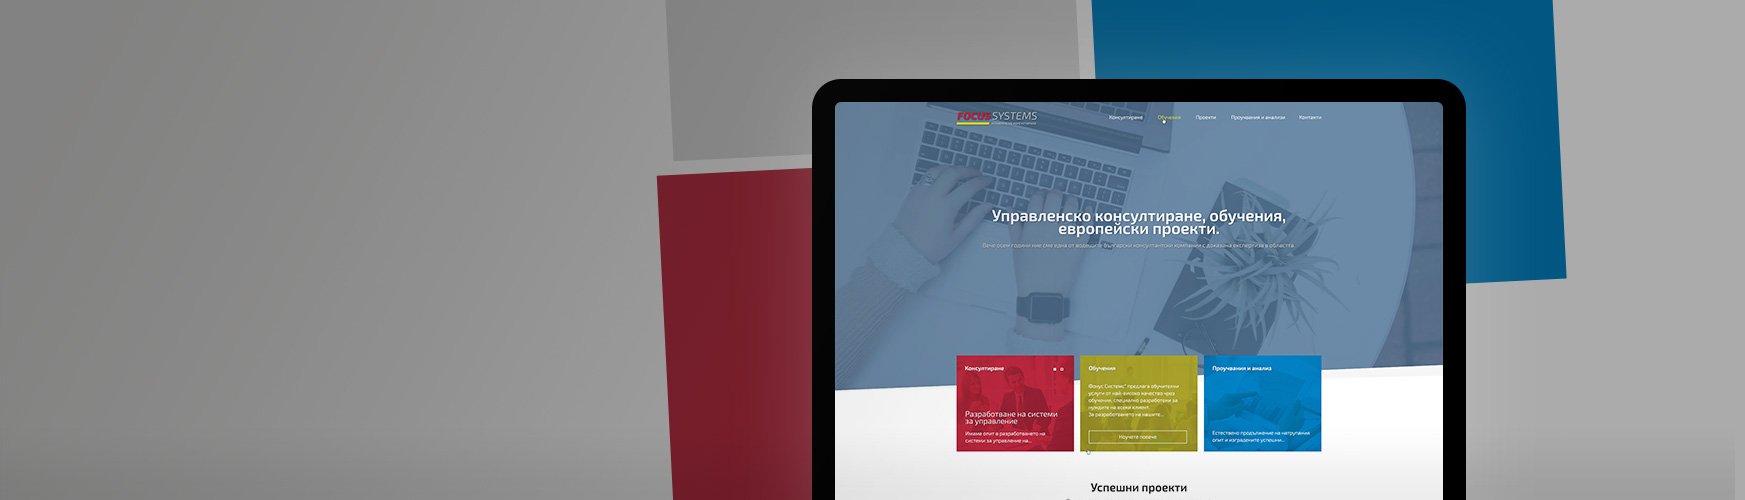 Изработка на WordPress-сайт за Focus Systems